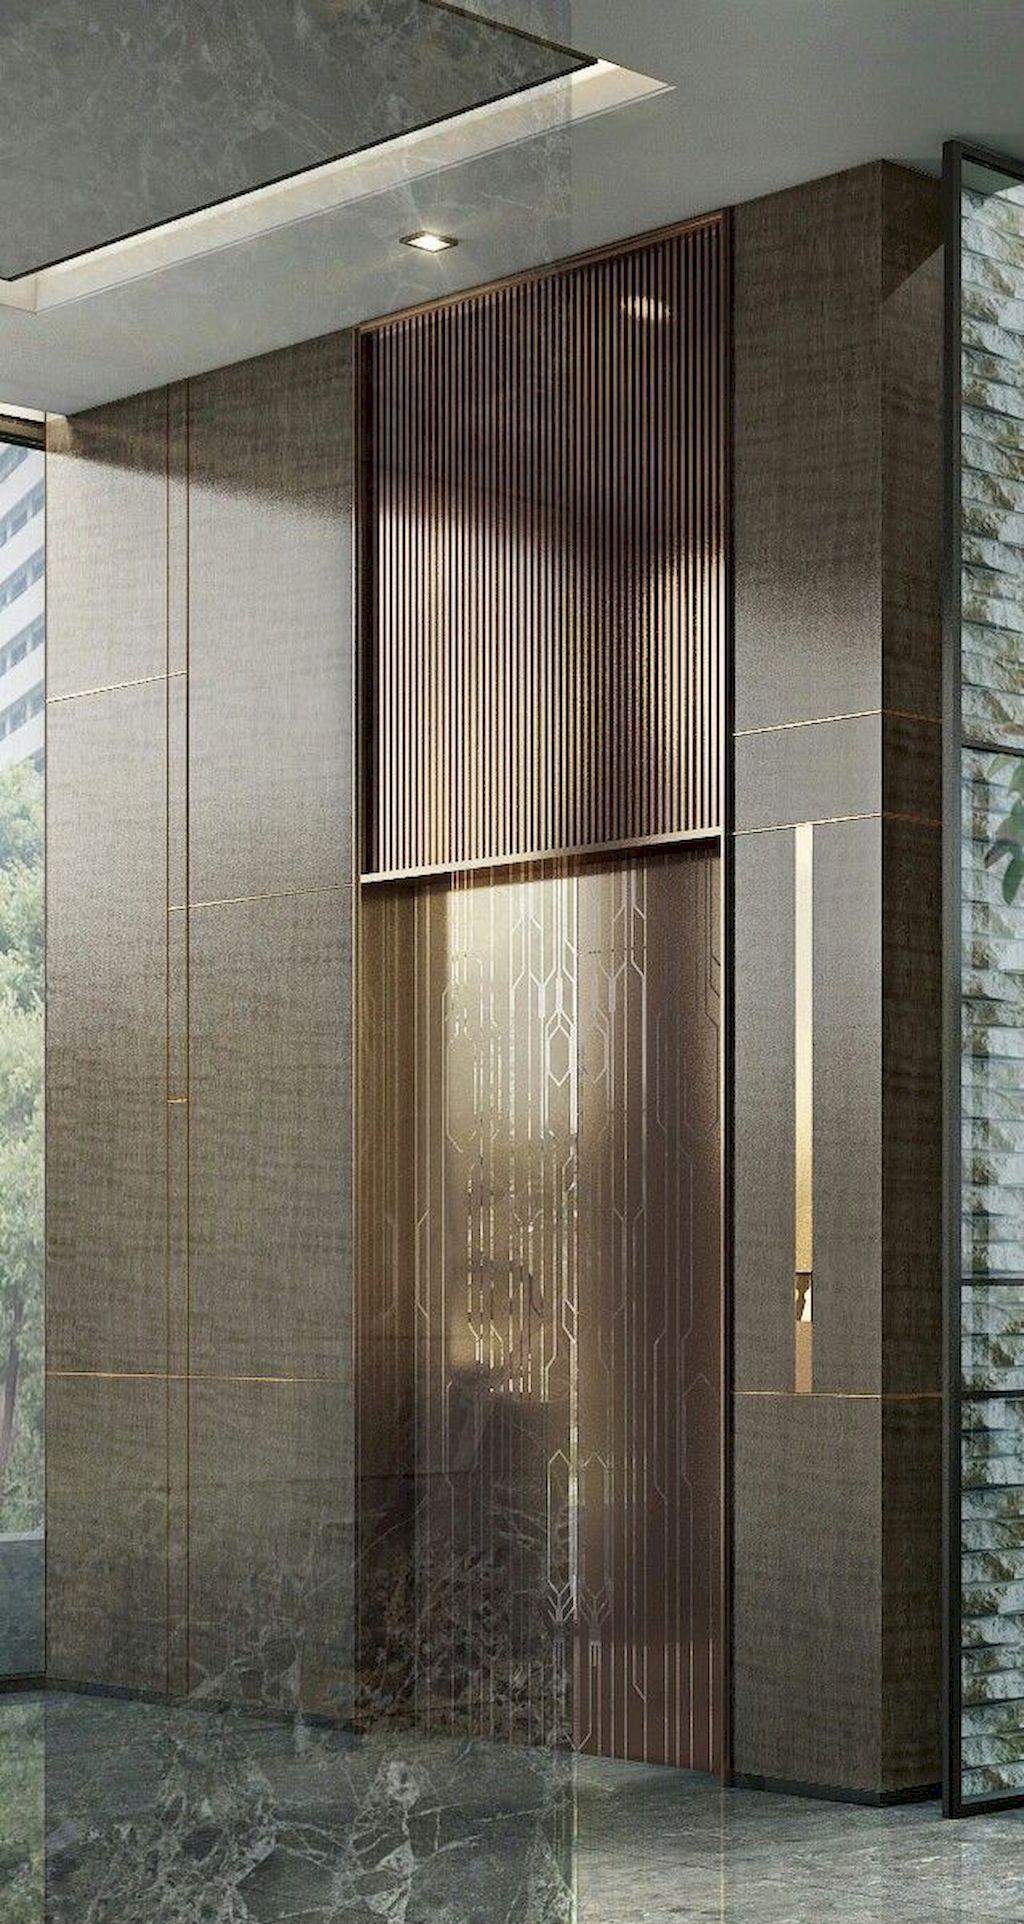 Door Design 1 With Images Hotel Lobby Design Elevator Lobby Design Lobby Design